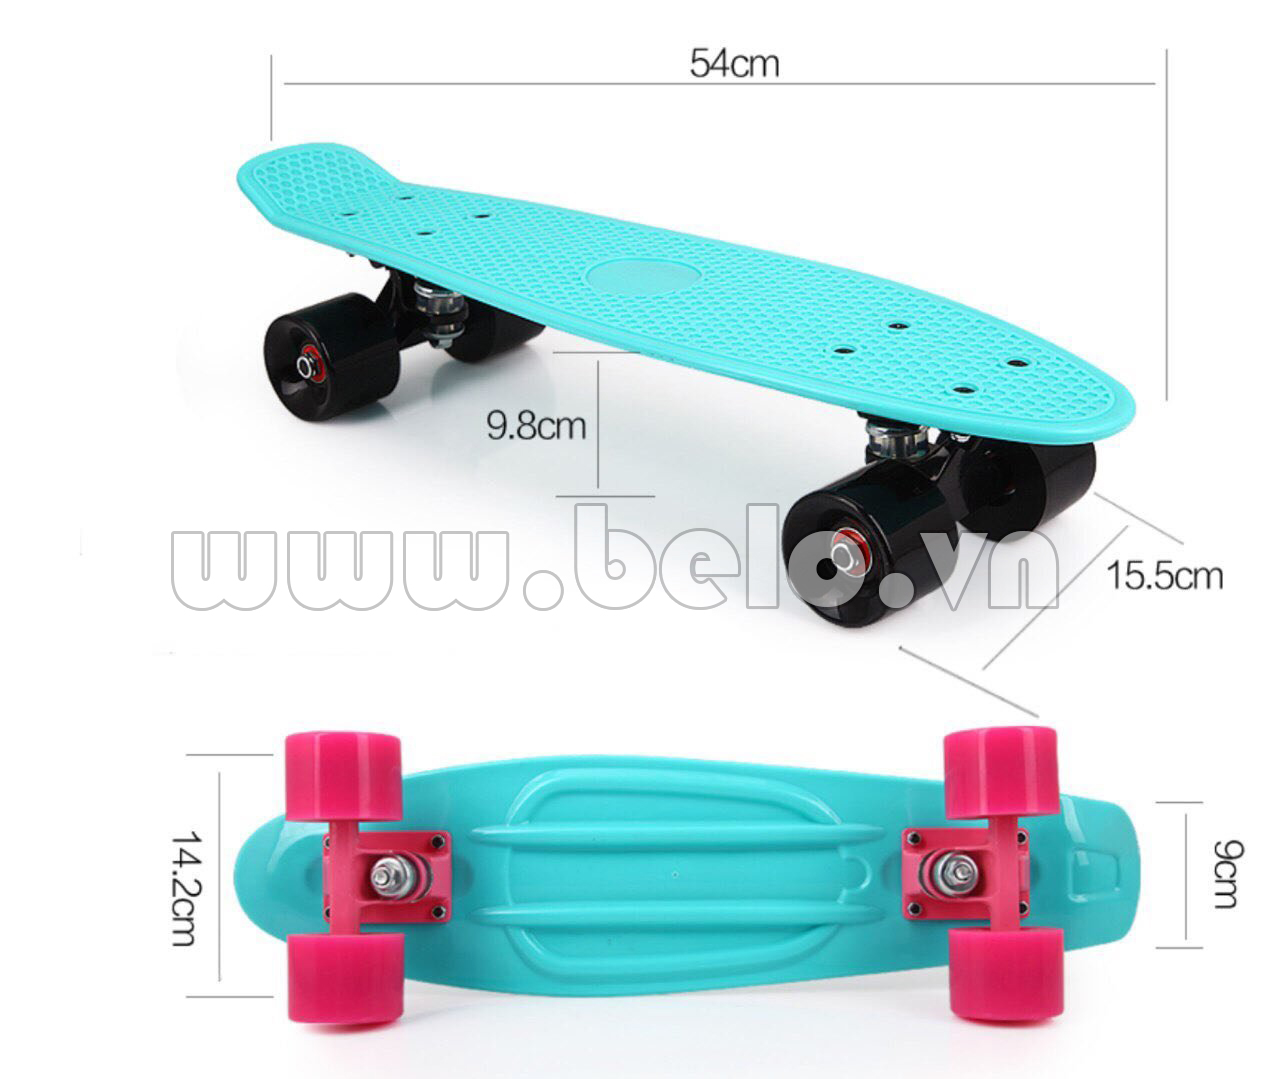 van-truot-skate-board-plastic-nhap-khau-gia-re-nhat-viet-nam-mau-xanh-bich